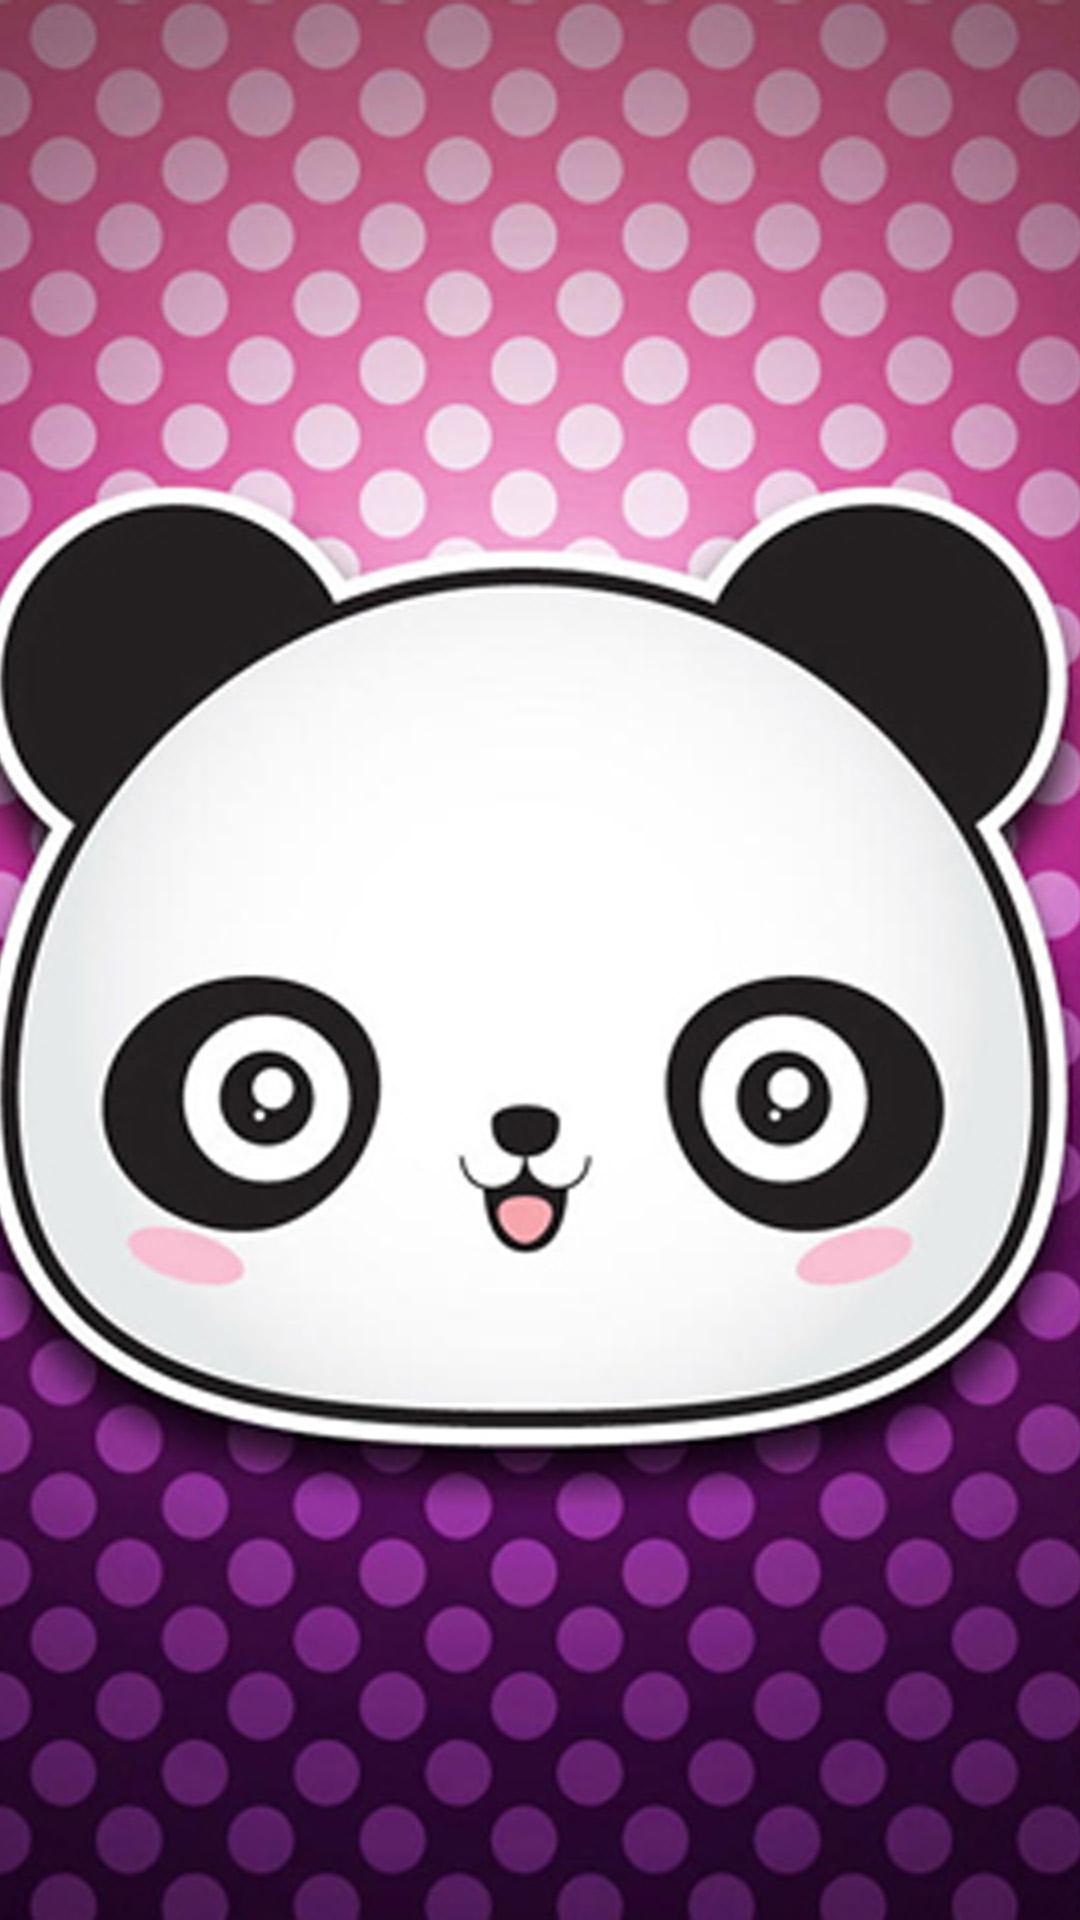 Cute panda tumblr themes - photo#36